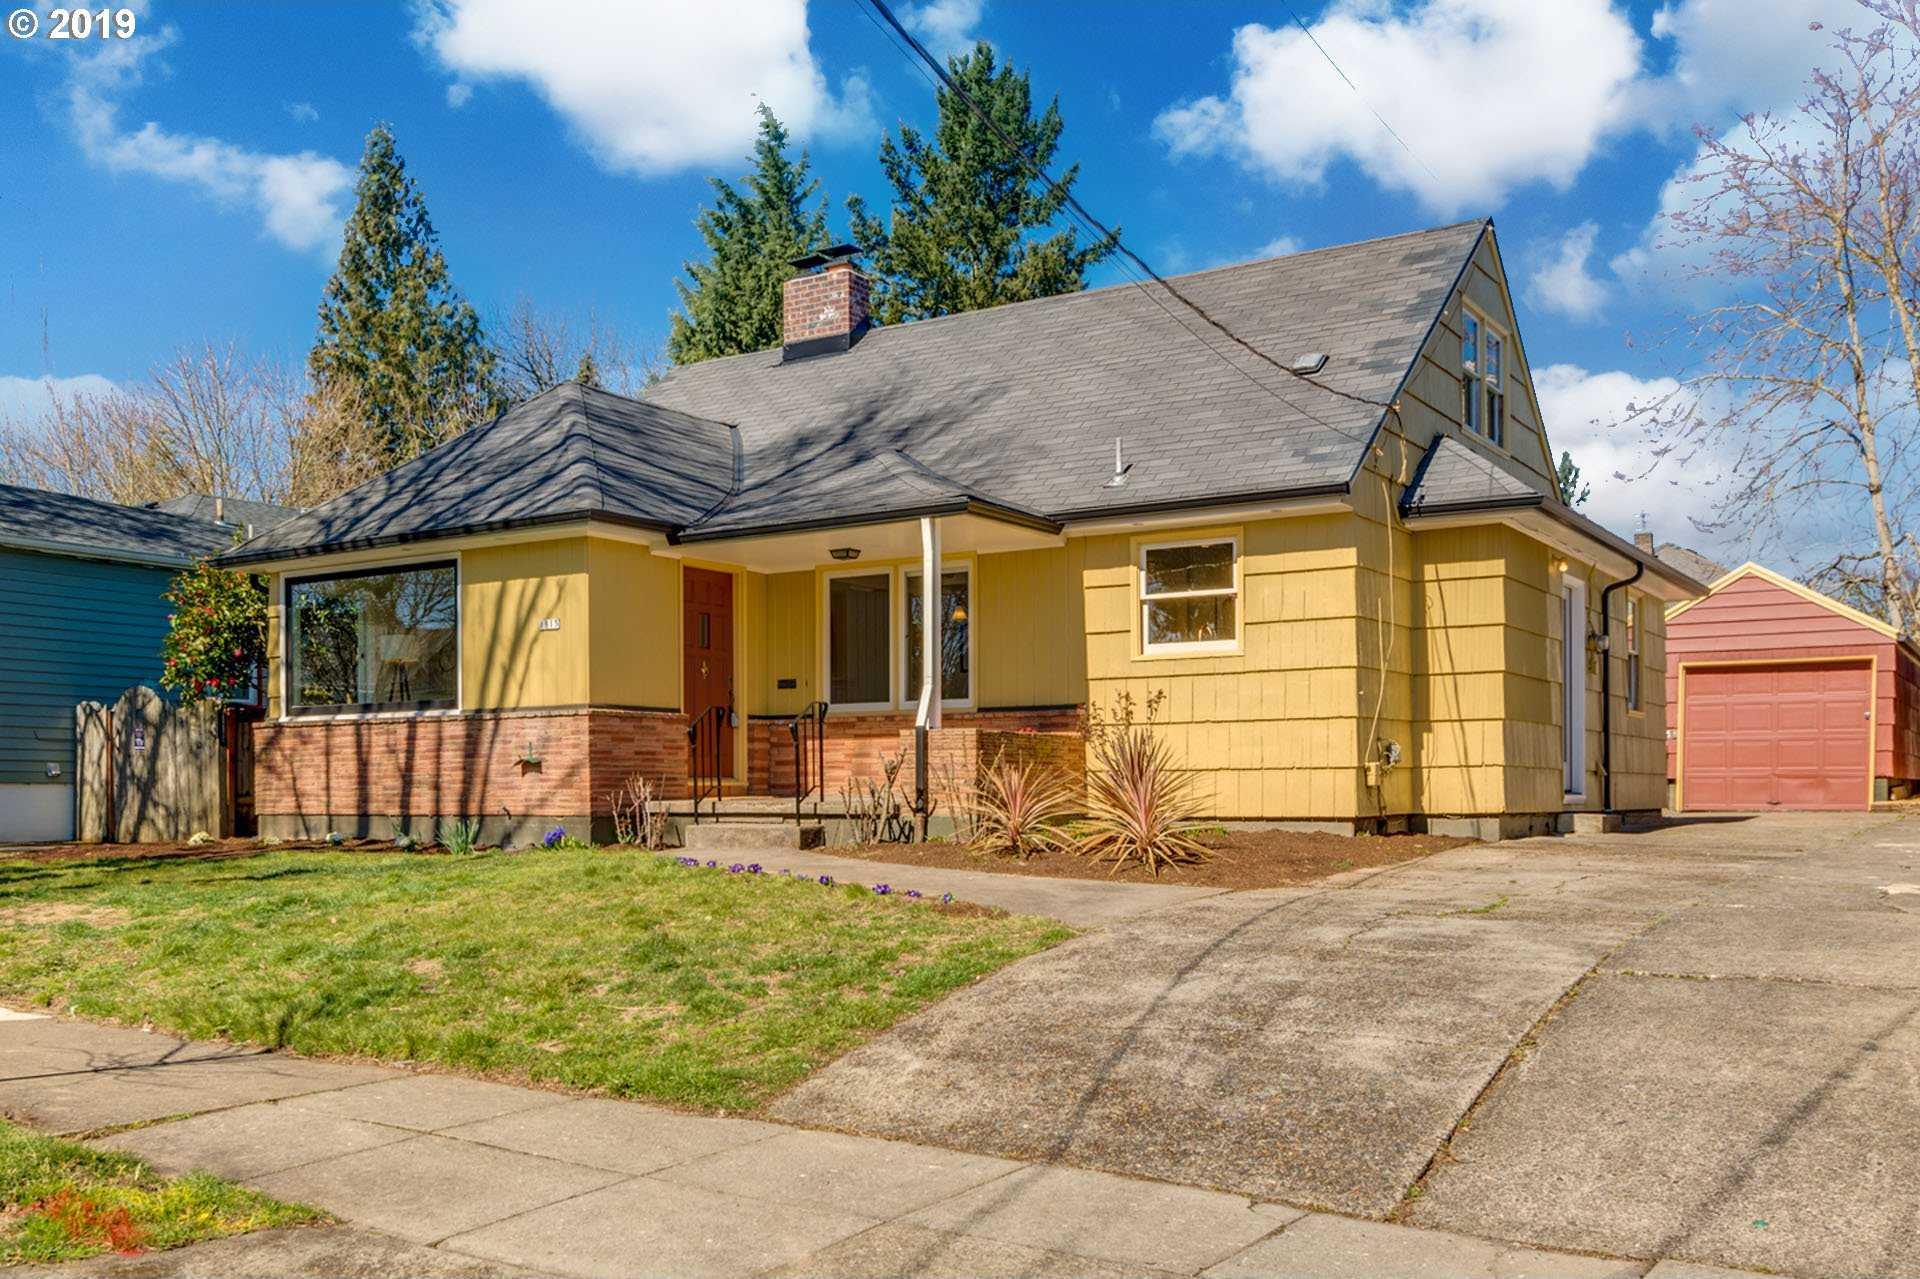 $529,000 - 3Br/1Ba -  for Sale in Sellwood - West Moreland, Portland